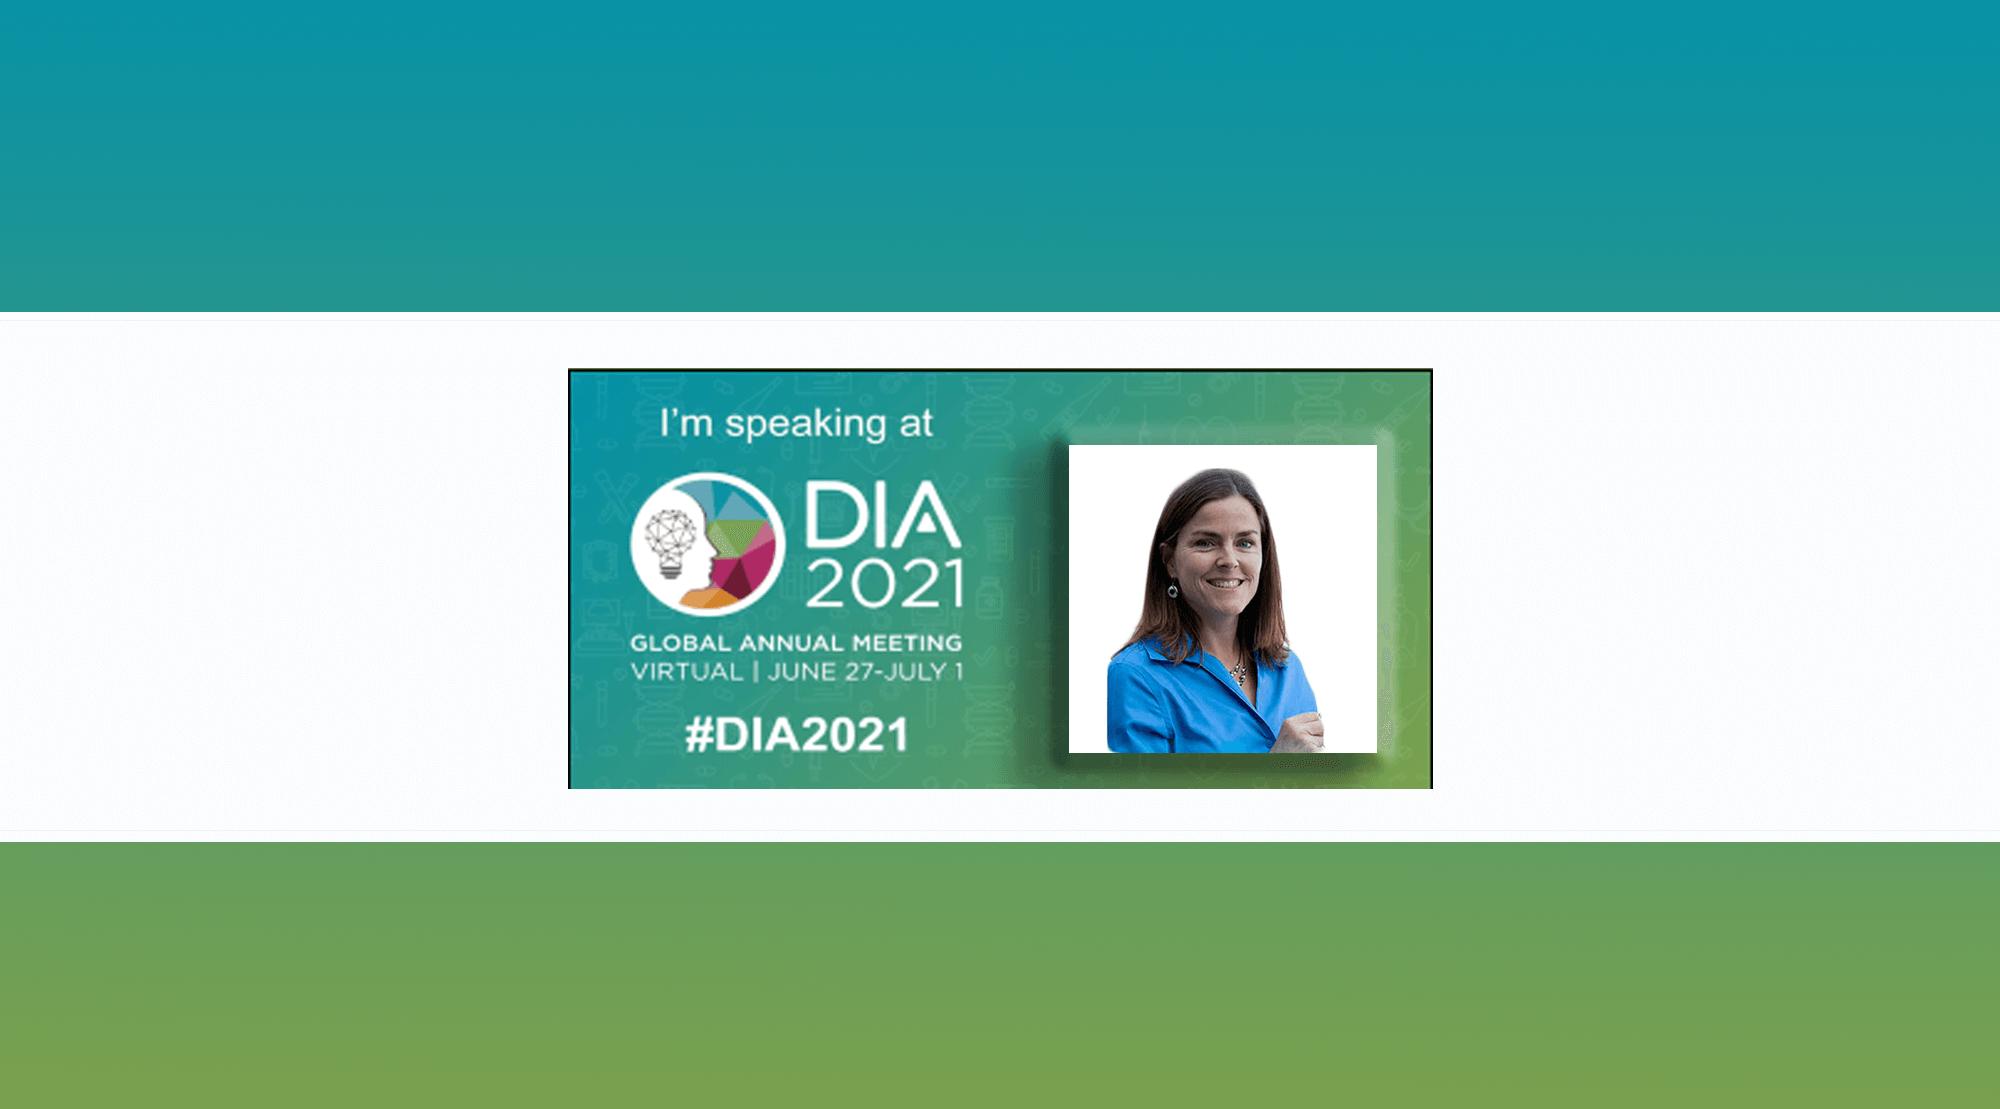 DIA 2021 Virtual Global Annual Meeting